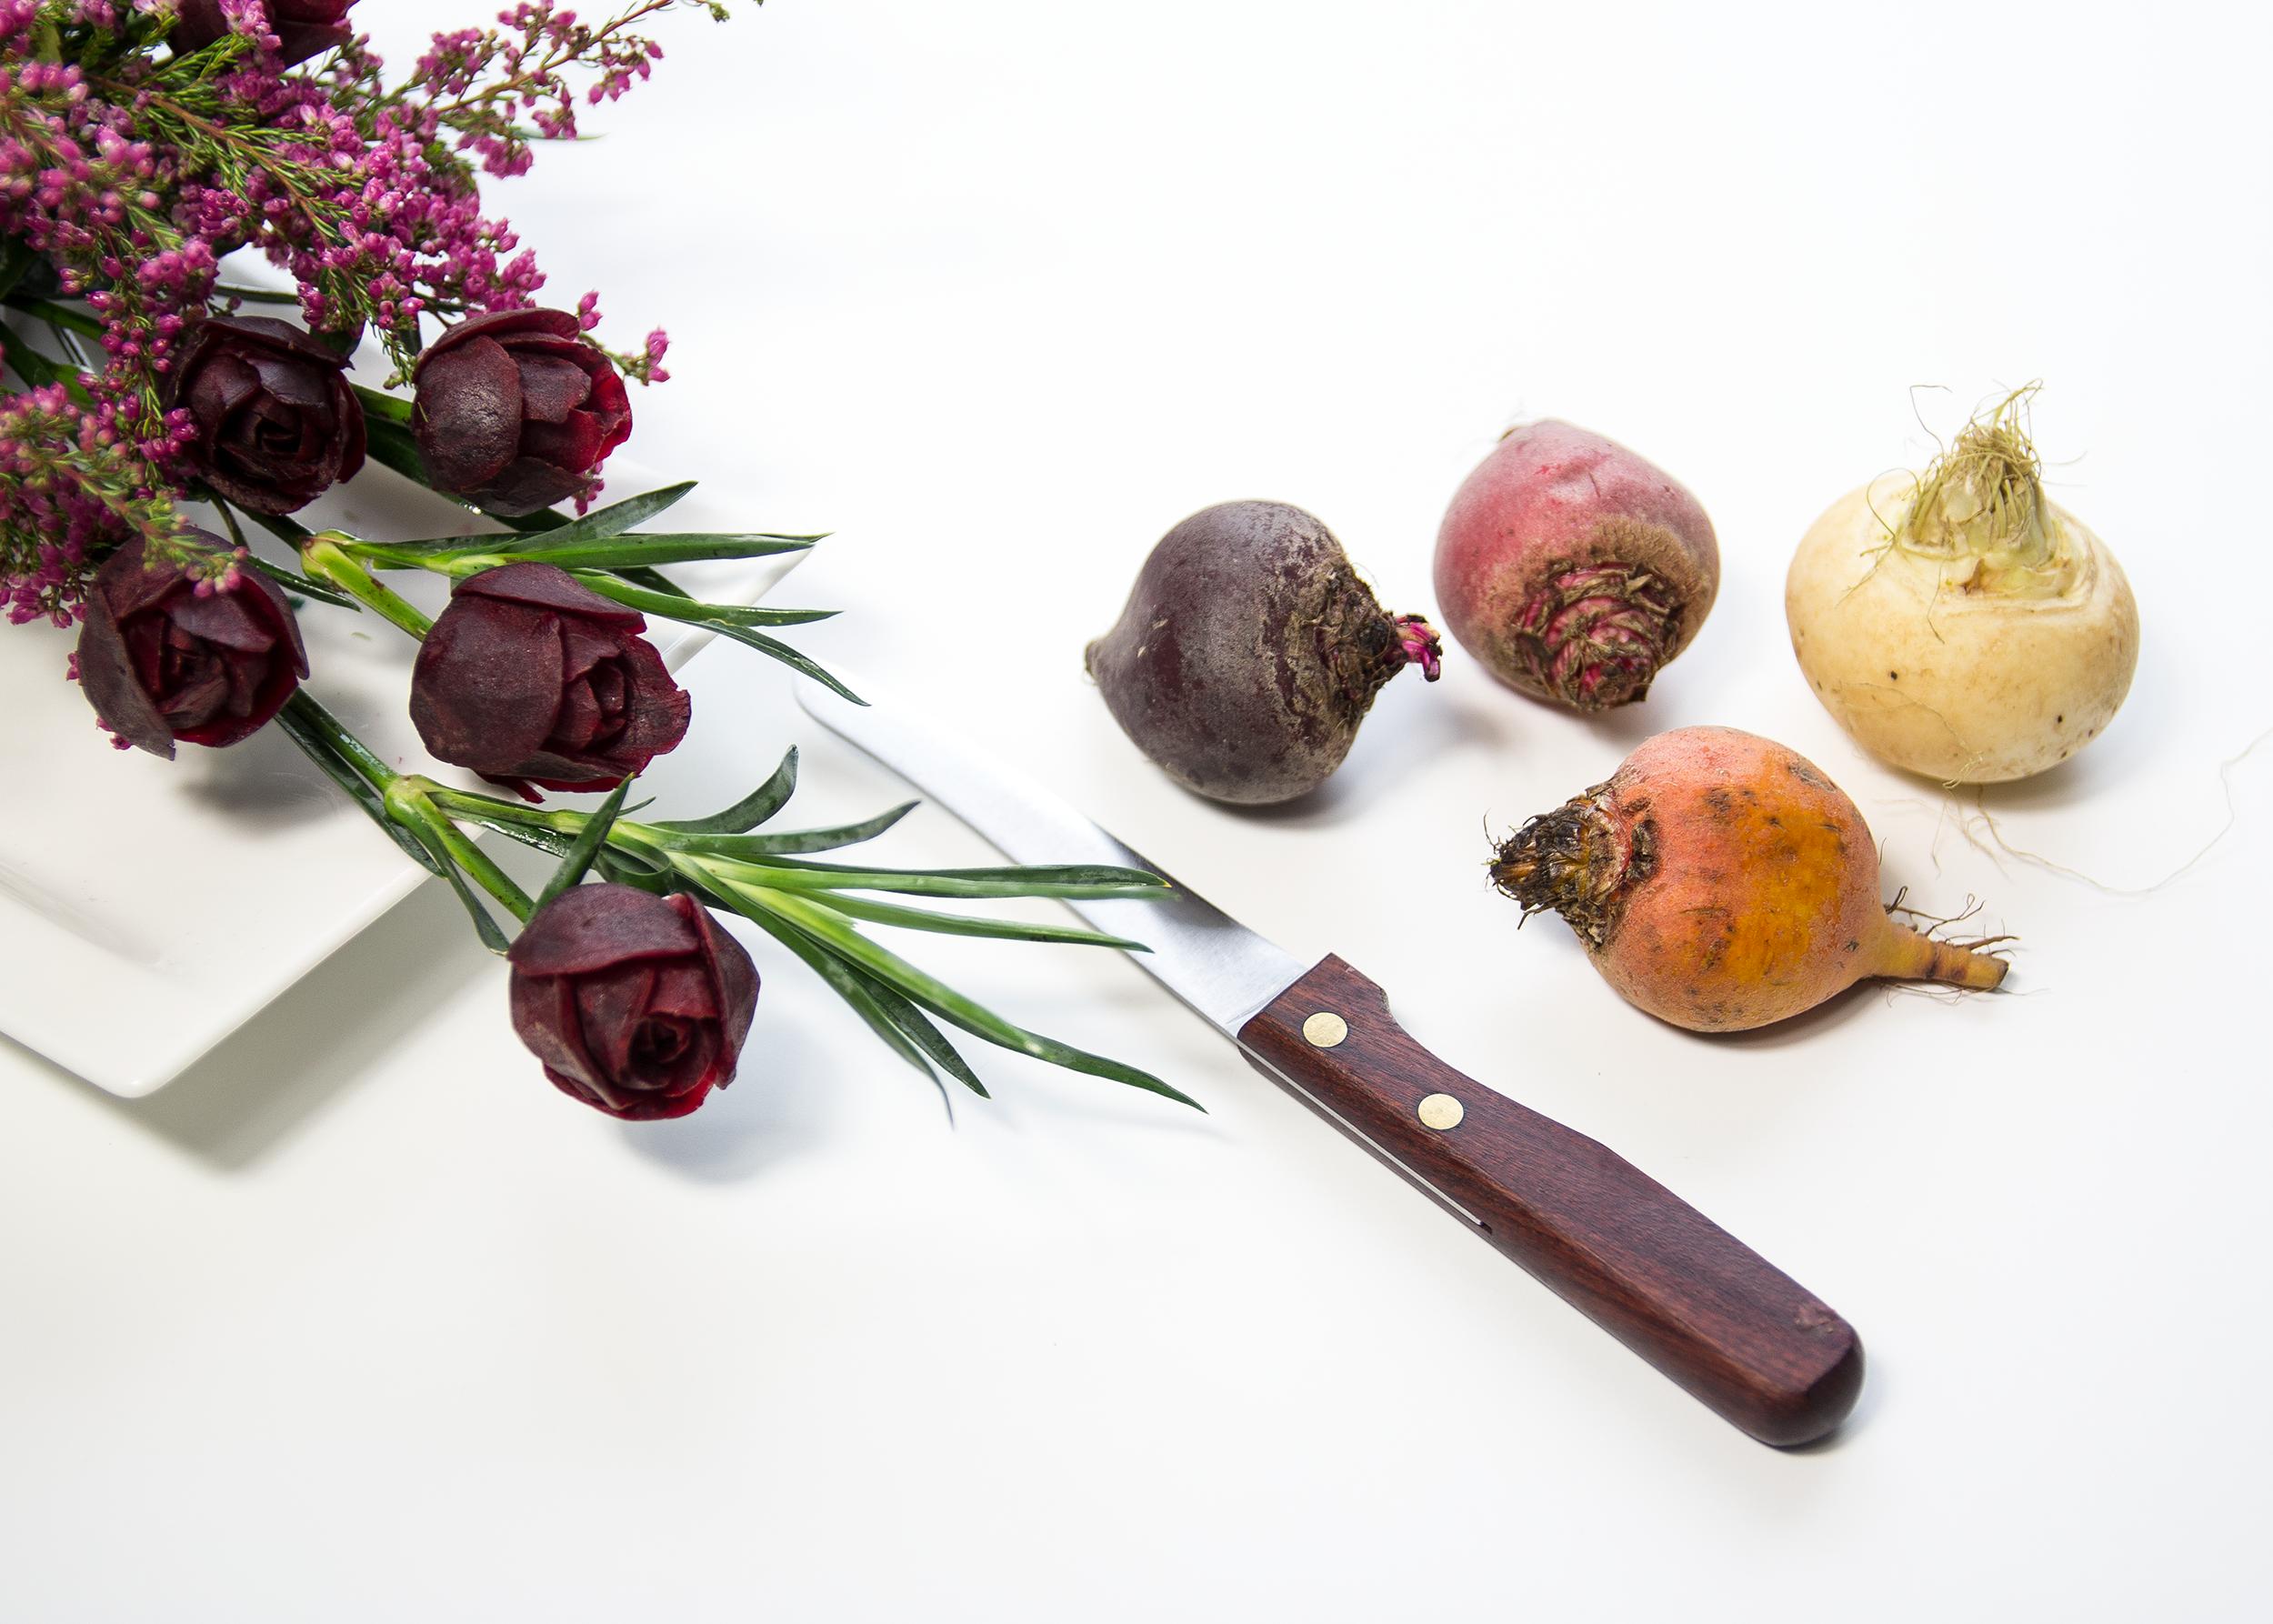 Nittiya - Viikon kevytyrittäjä FruitGarden